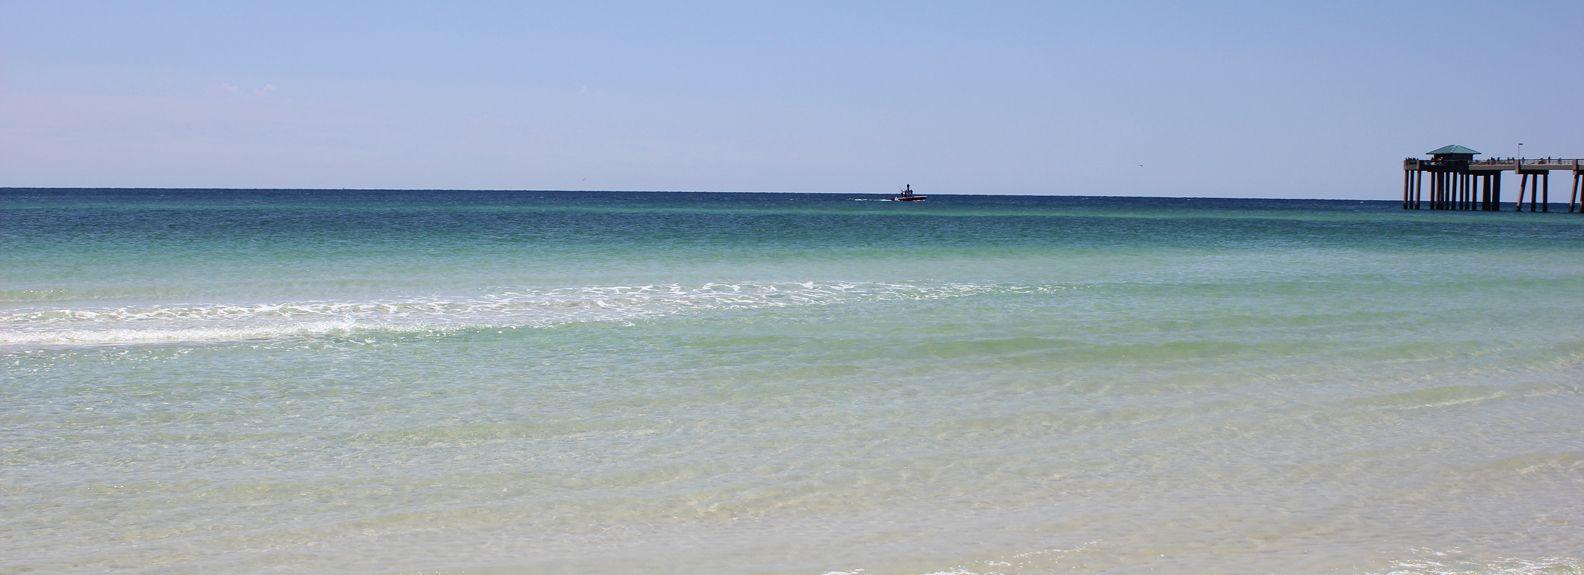 Gulfside Condos (Okaloosa Island, Floride, États-Unis d'Amérique)